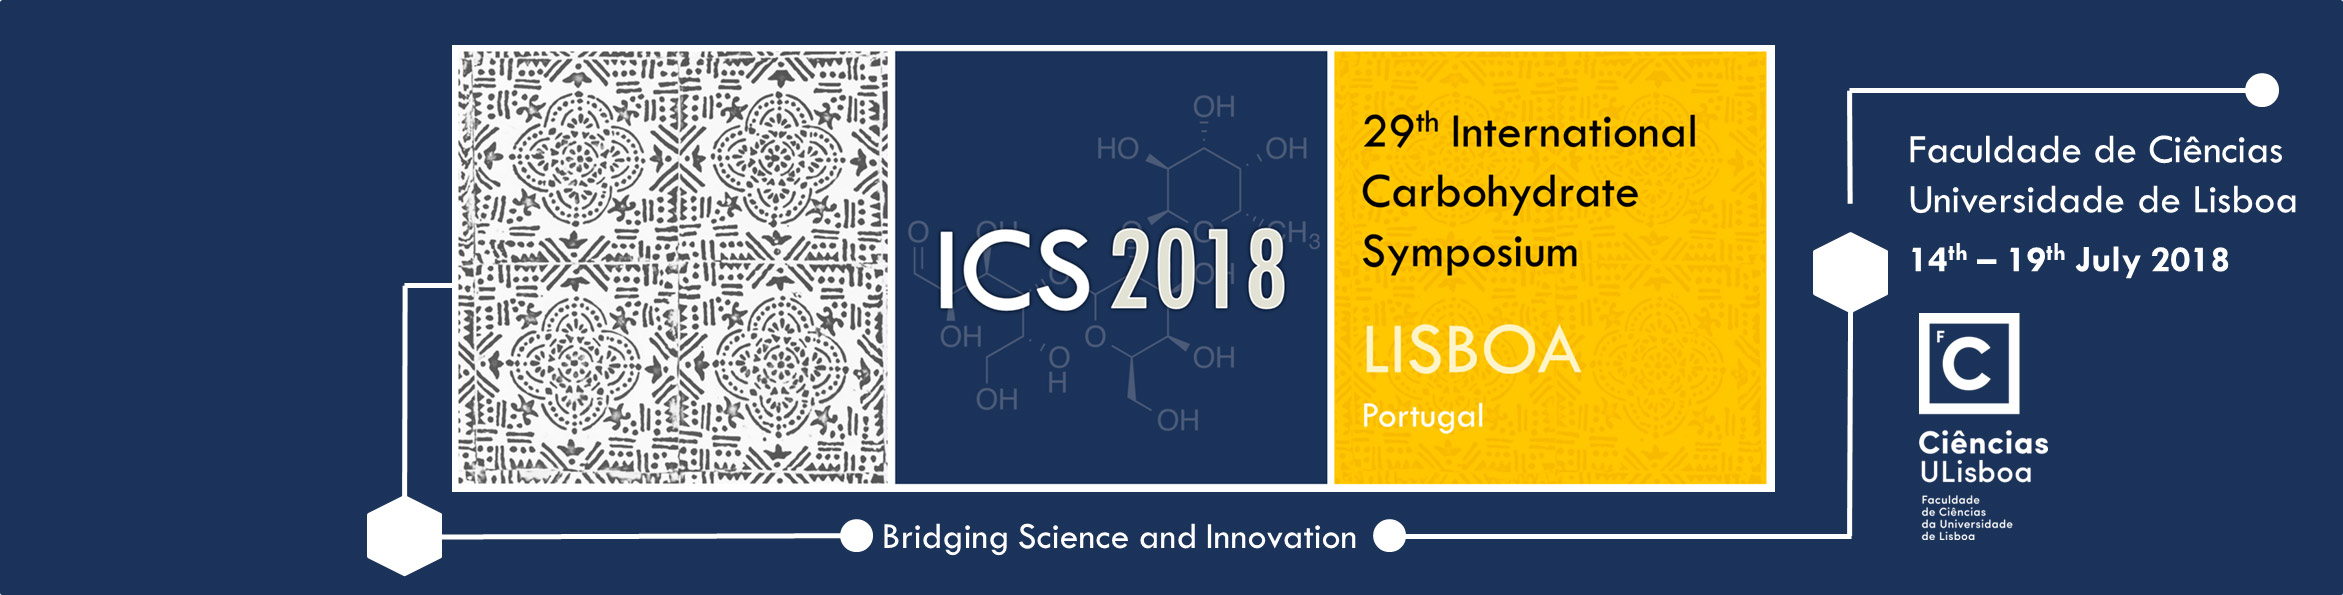 29th International Carbohydrate Symposium Ics 2018